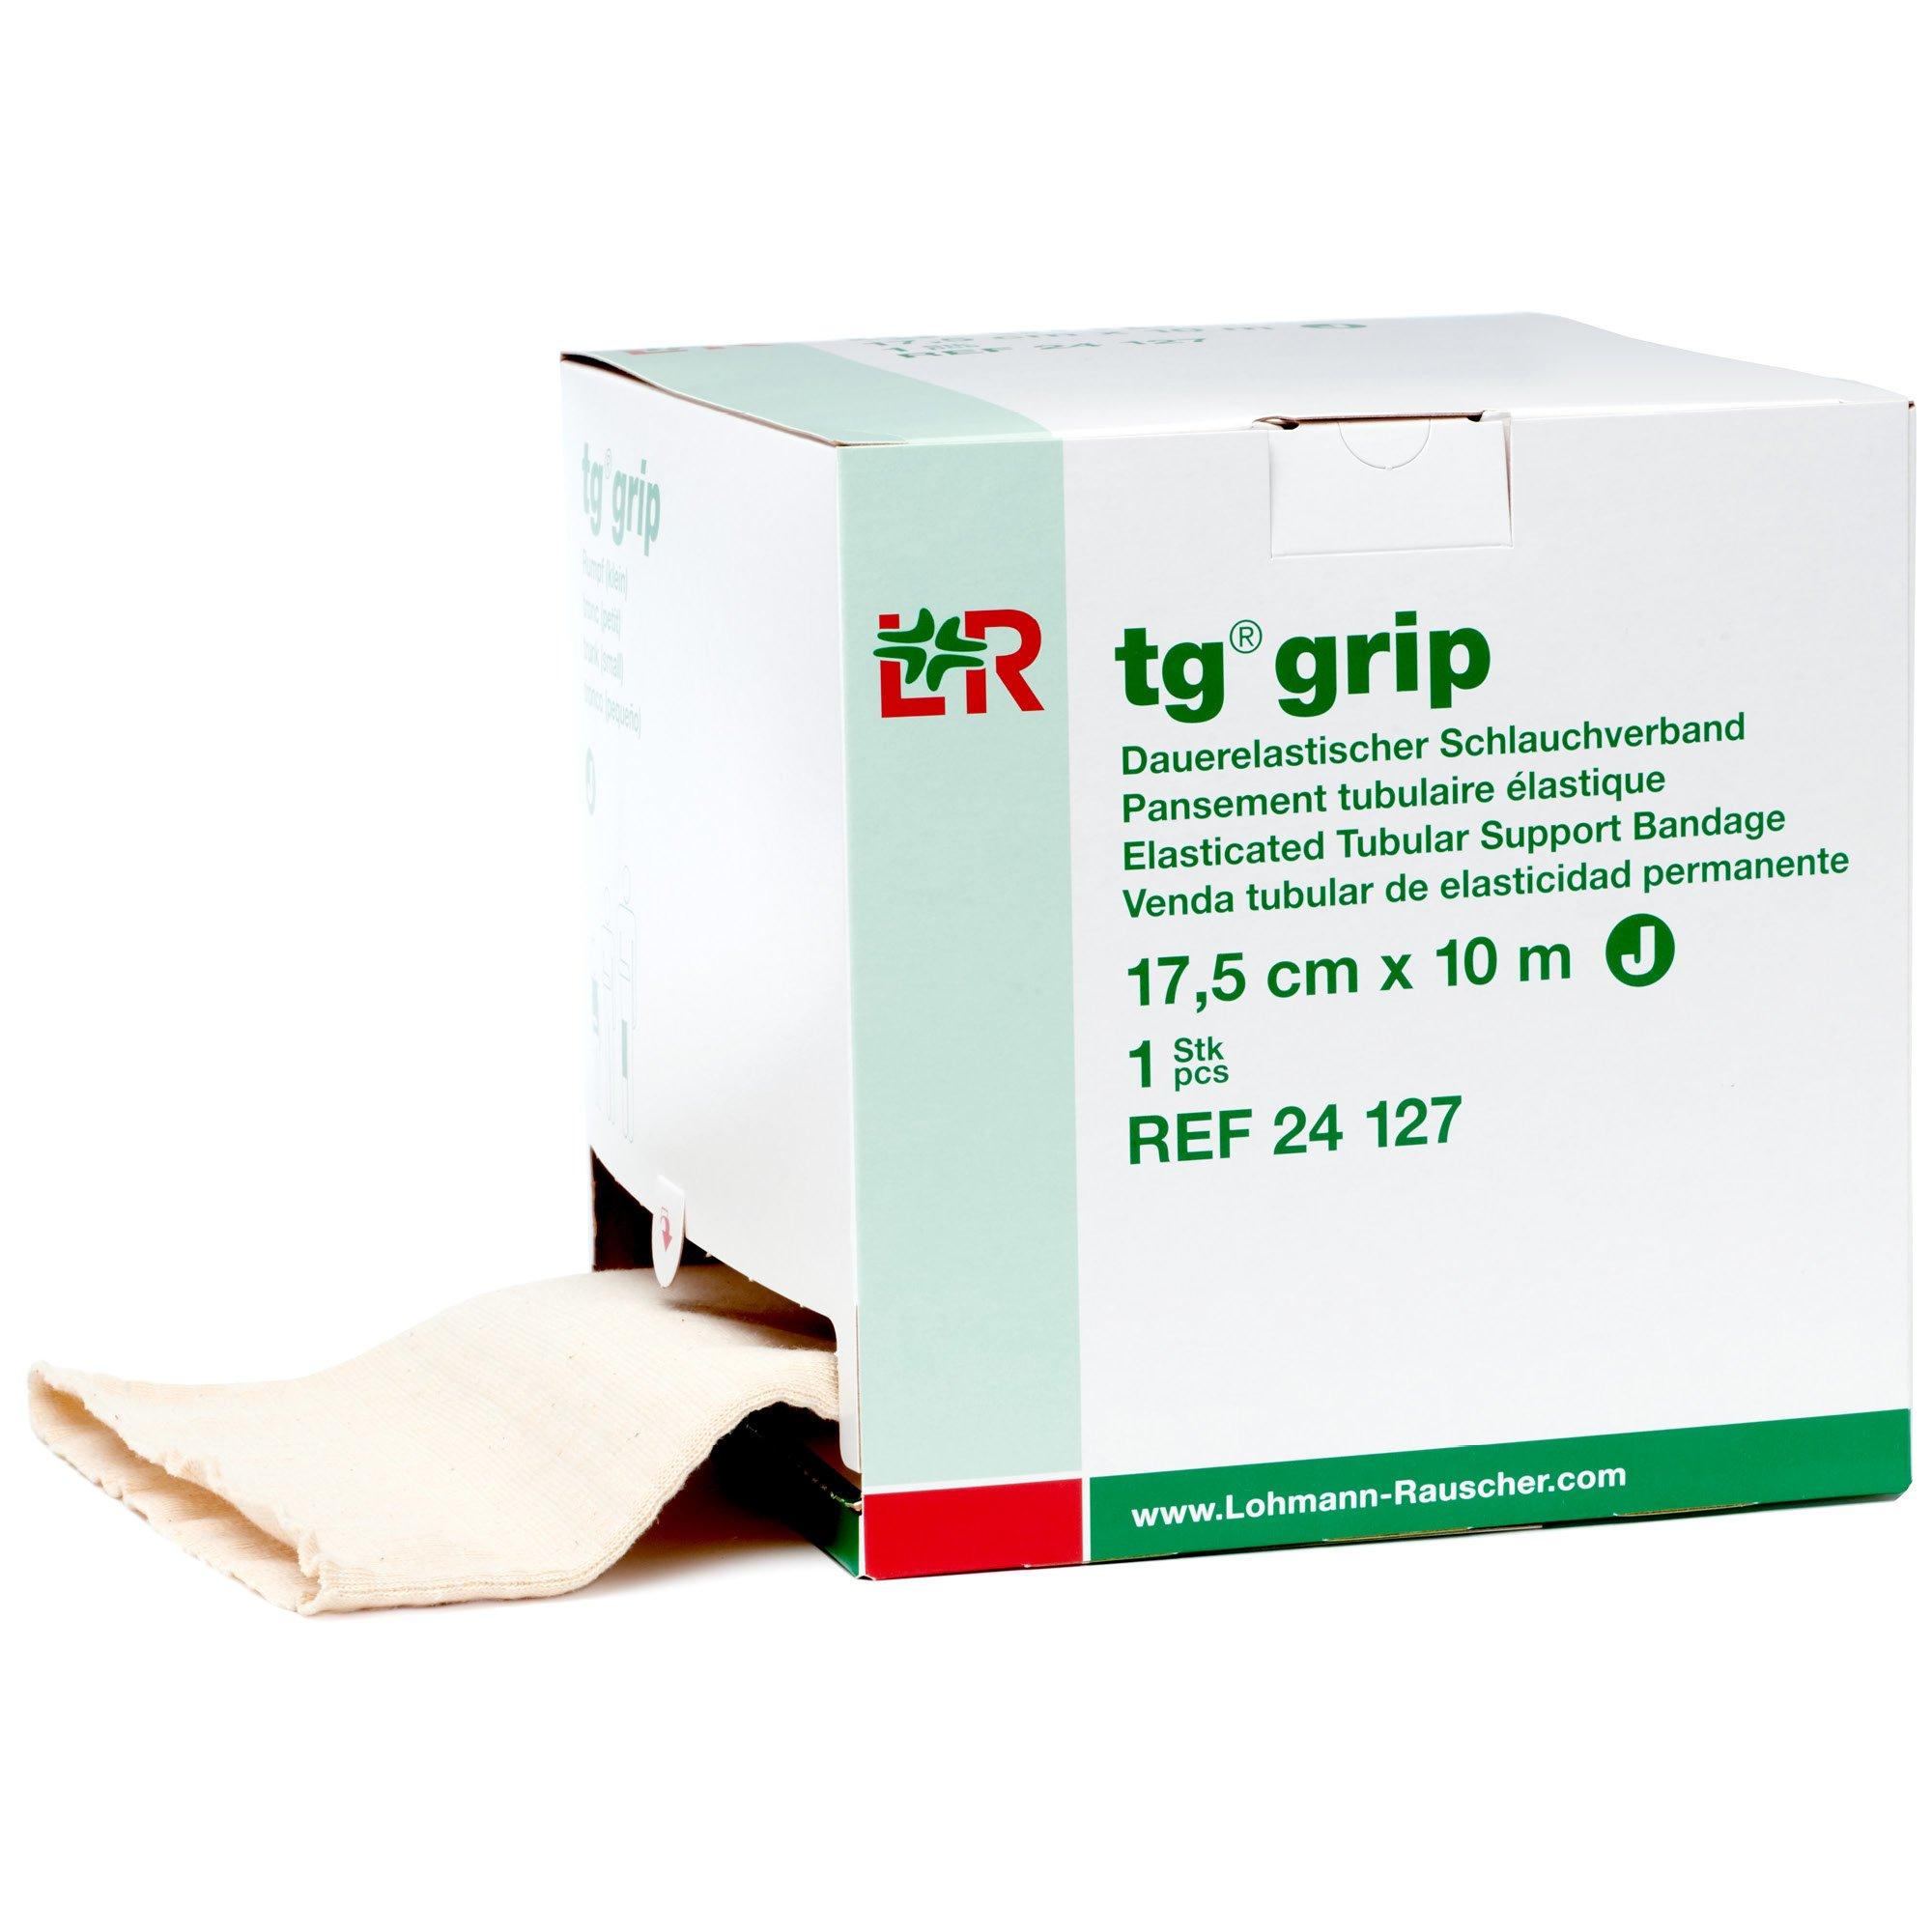 tg Grip Elastic Tubular Compression Bandage, Seamless Tube Stockinette Wrap for Retention, Lymphedema, Swelling, 85% Cotton, Washable & Reusable, Size J